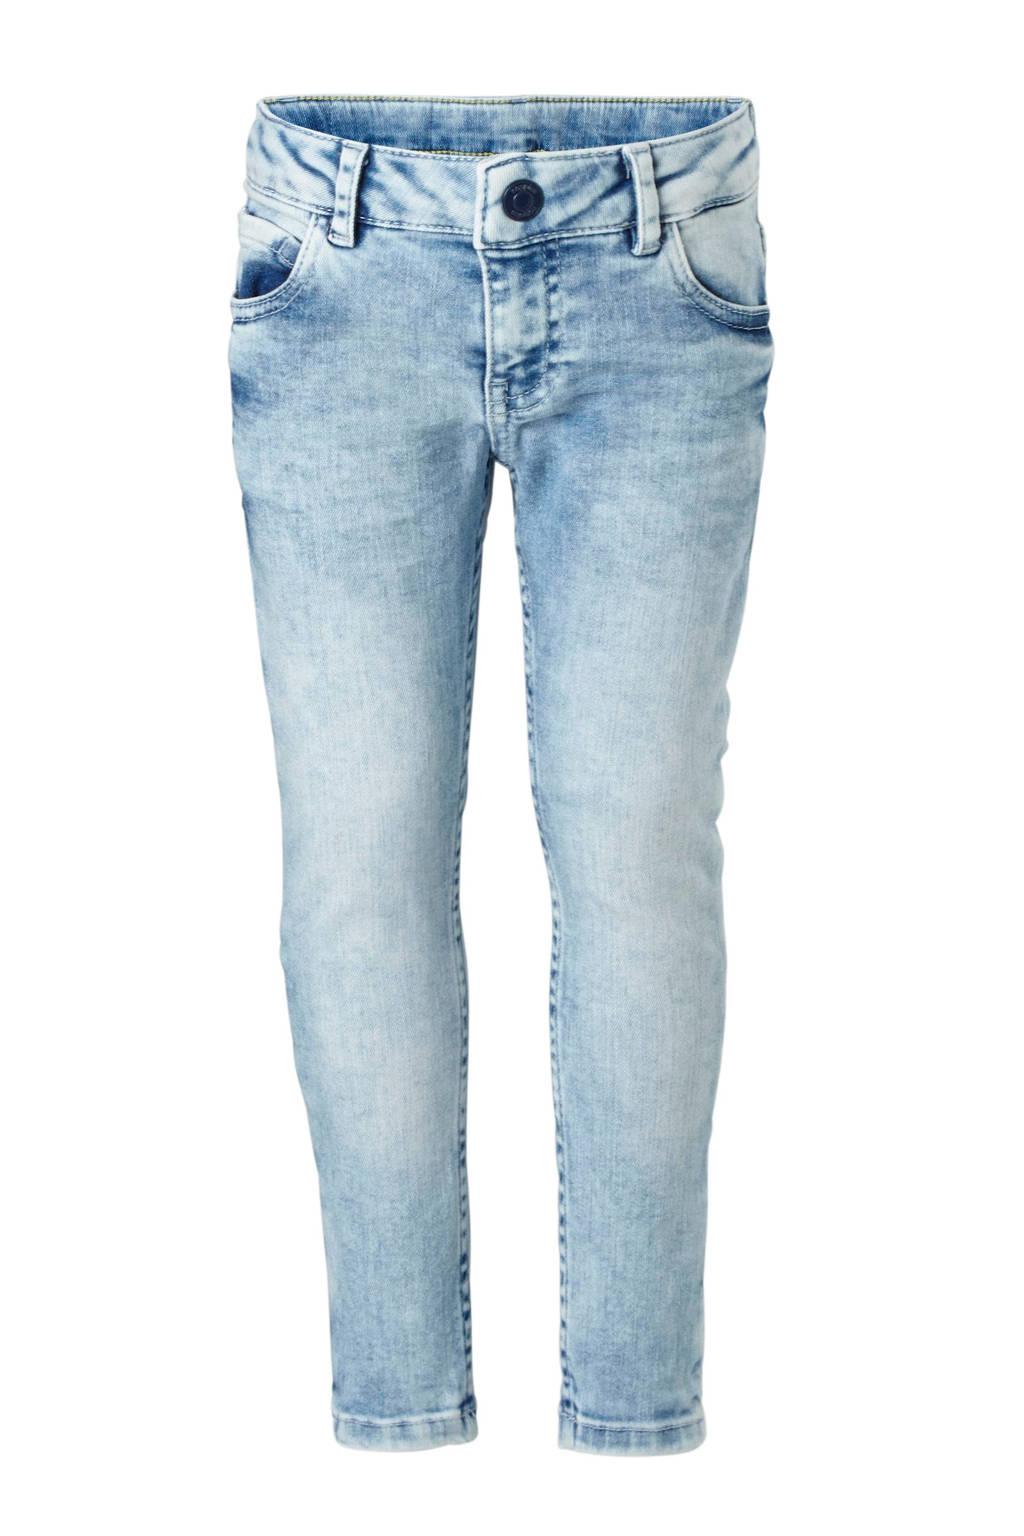 Noppies slim fit jeans Royal, Lichtblauw